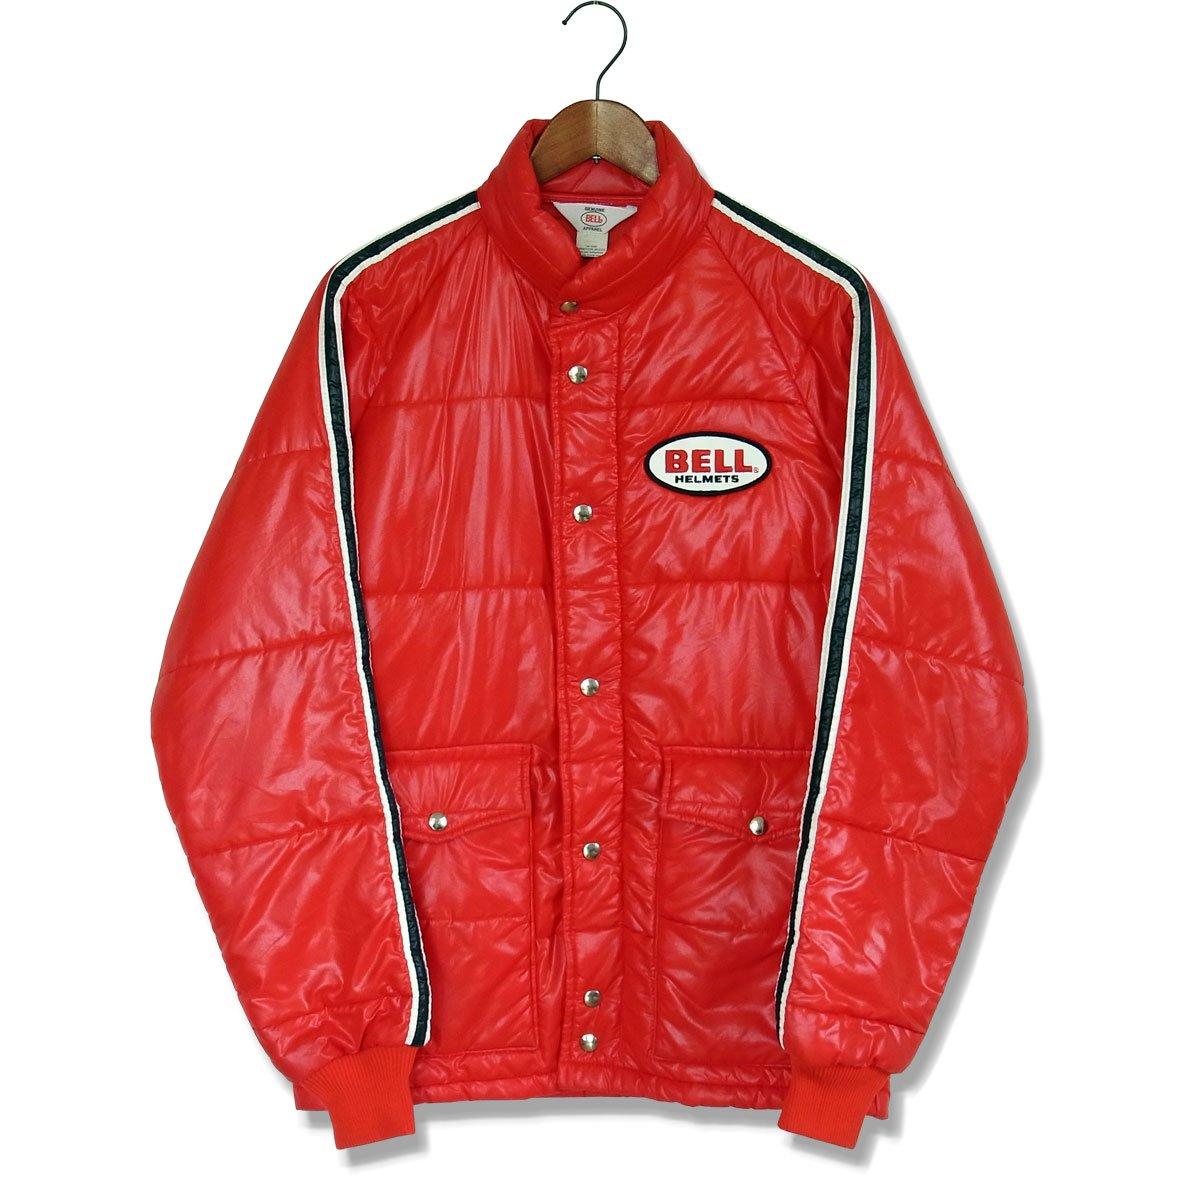 BELL レーシングジャケット